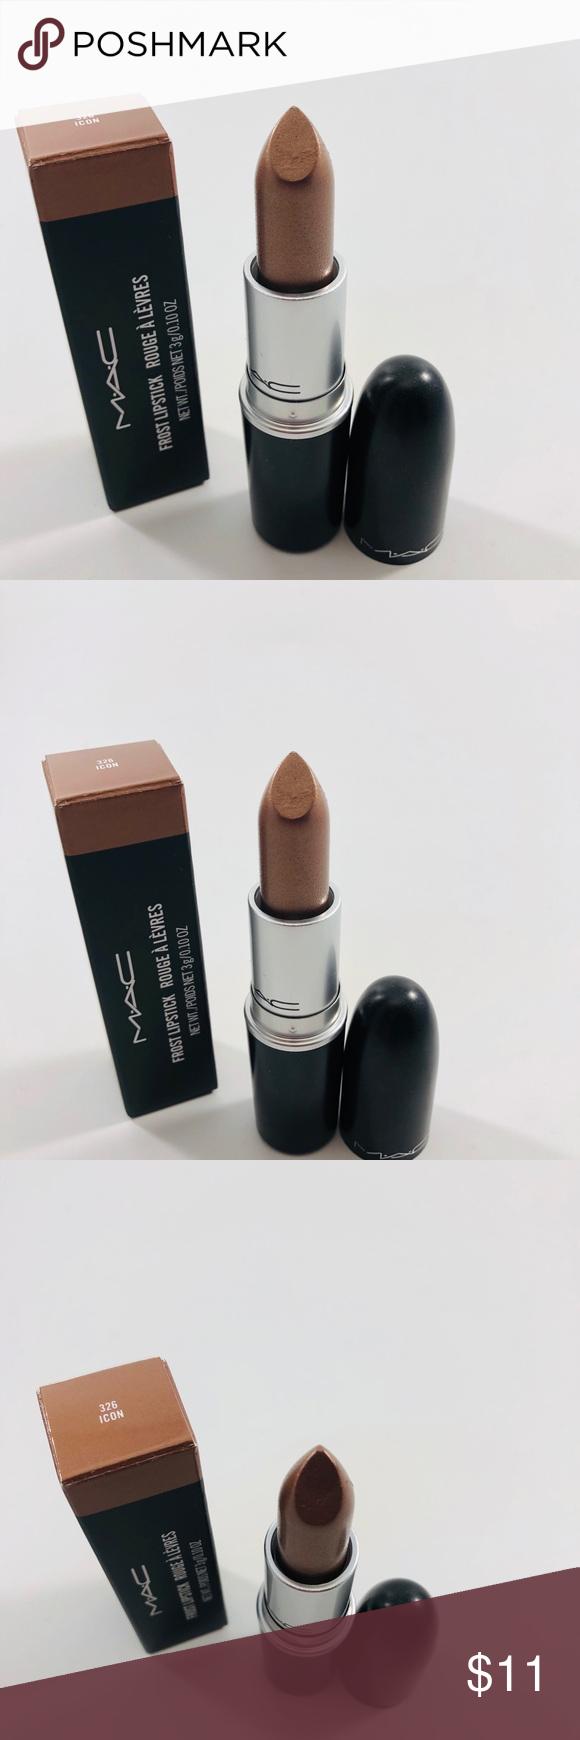 MAC Frost Lipstick 326 Icon Frosted lipstick, Lipstick